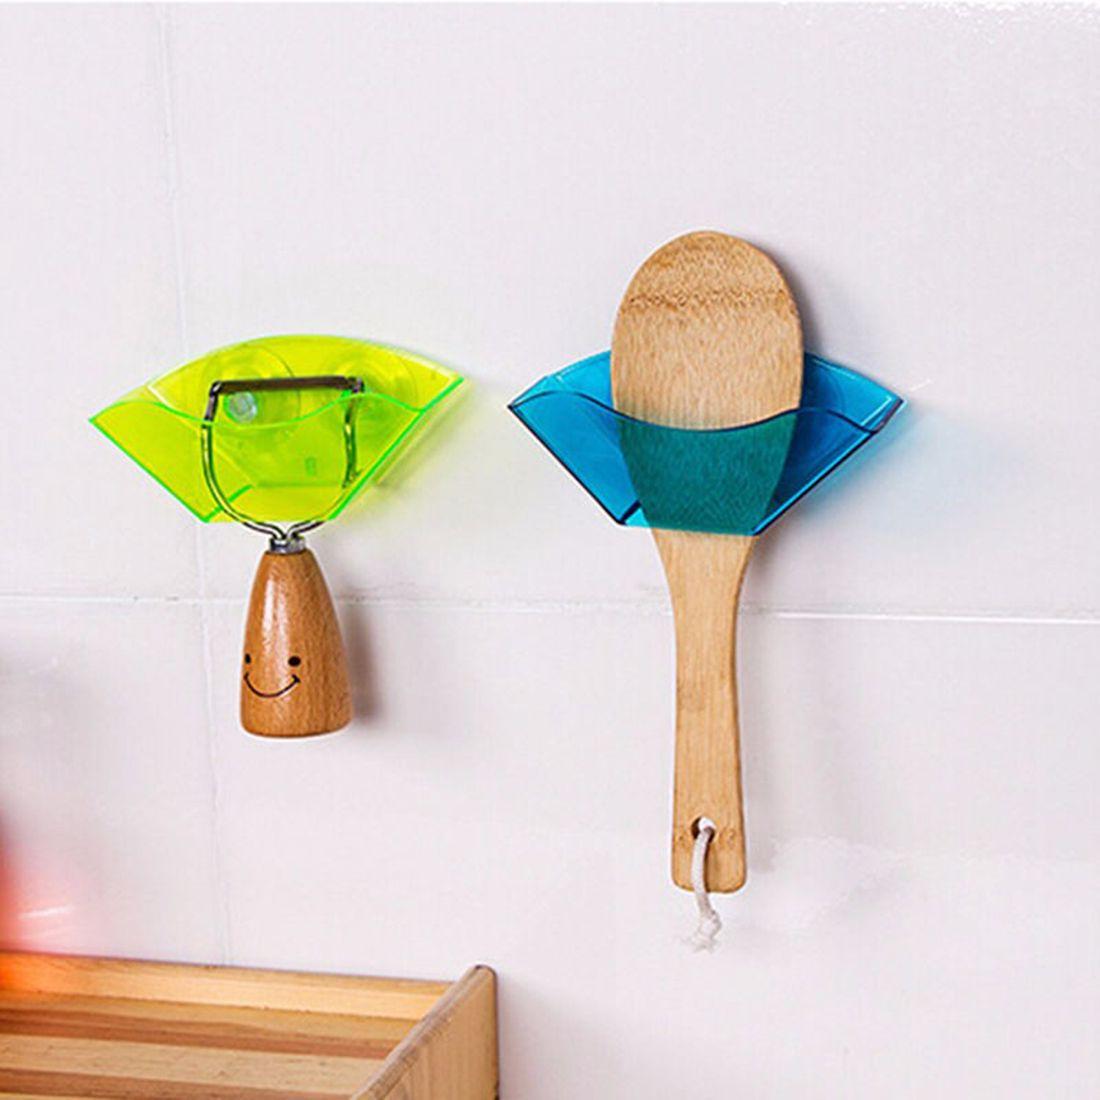 1pc Useful Double Suction Cup Sink Shelf Soap Dish Holder Sponge Drain Rack Kitchen Sucker Storage Tool Color Random